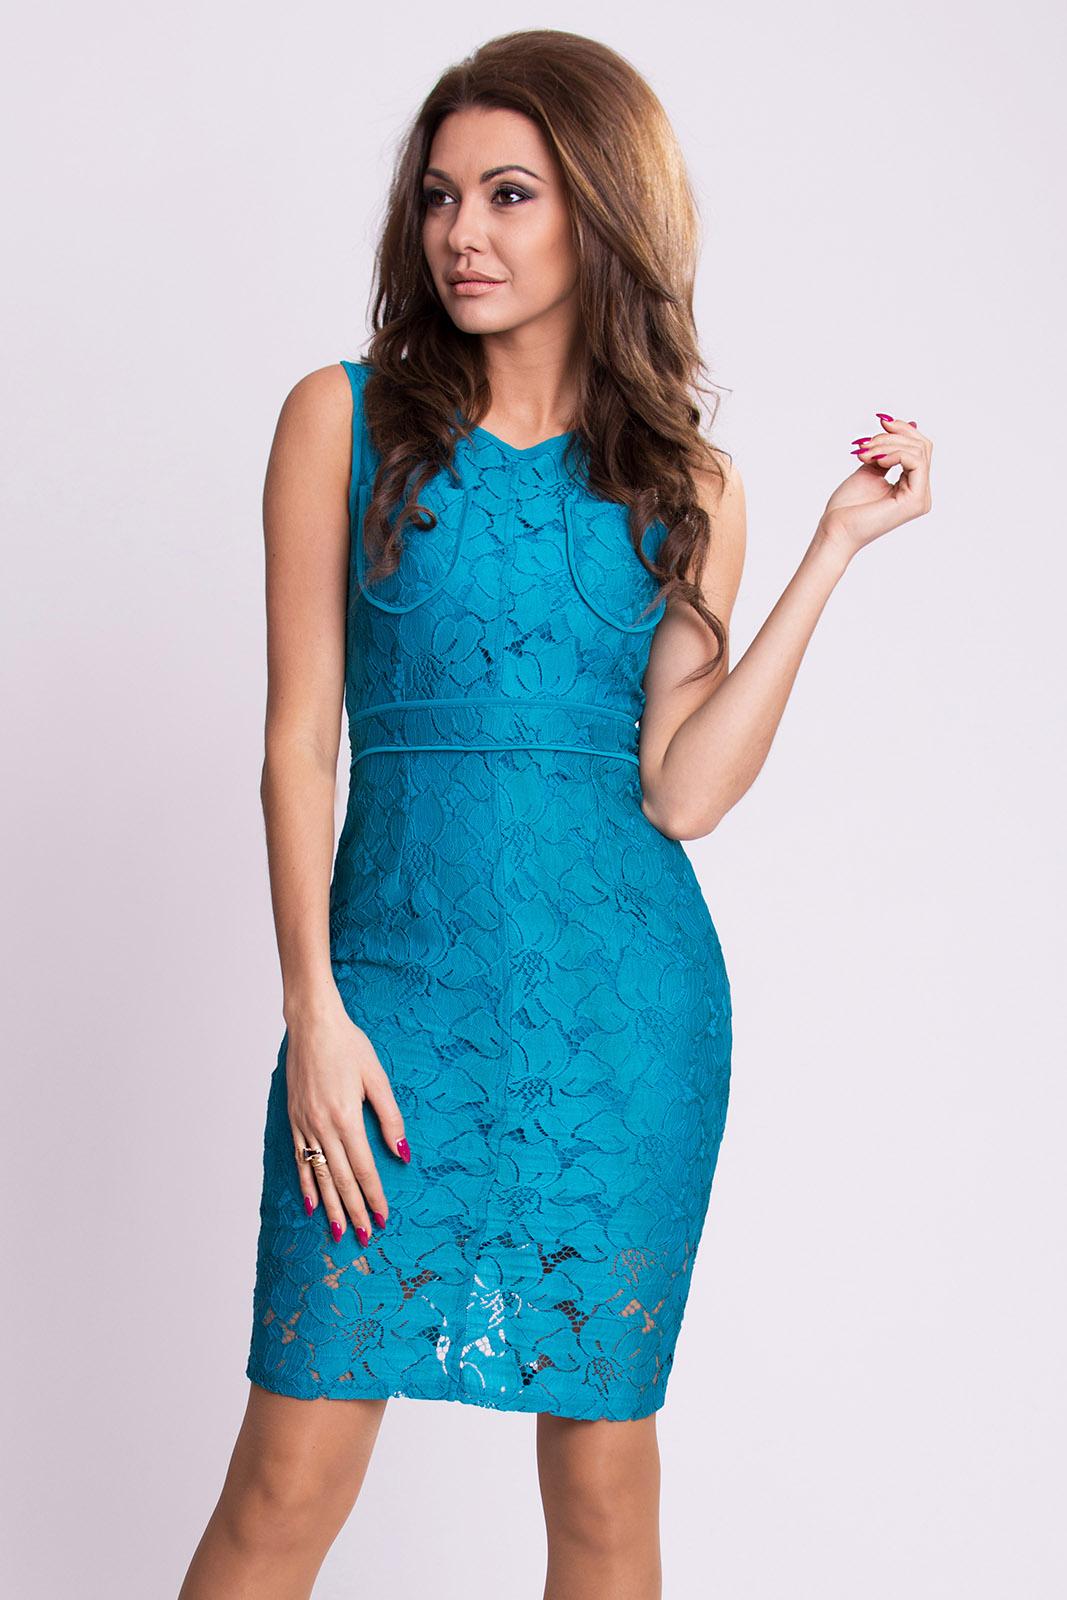 EMAMODA DRESS - dark blue 97..